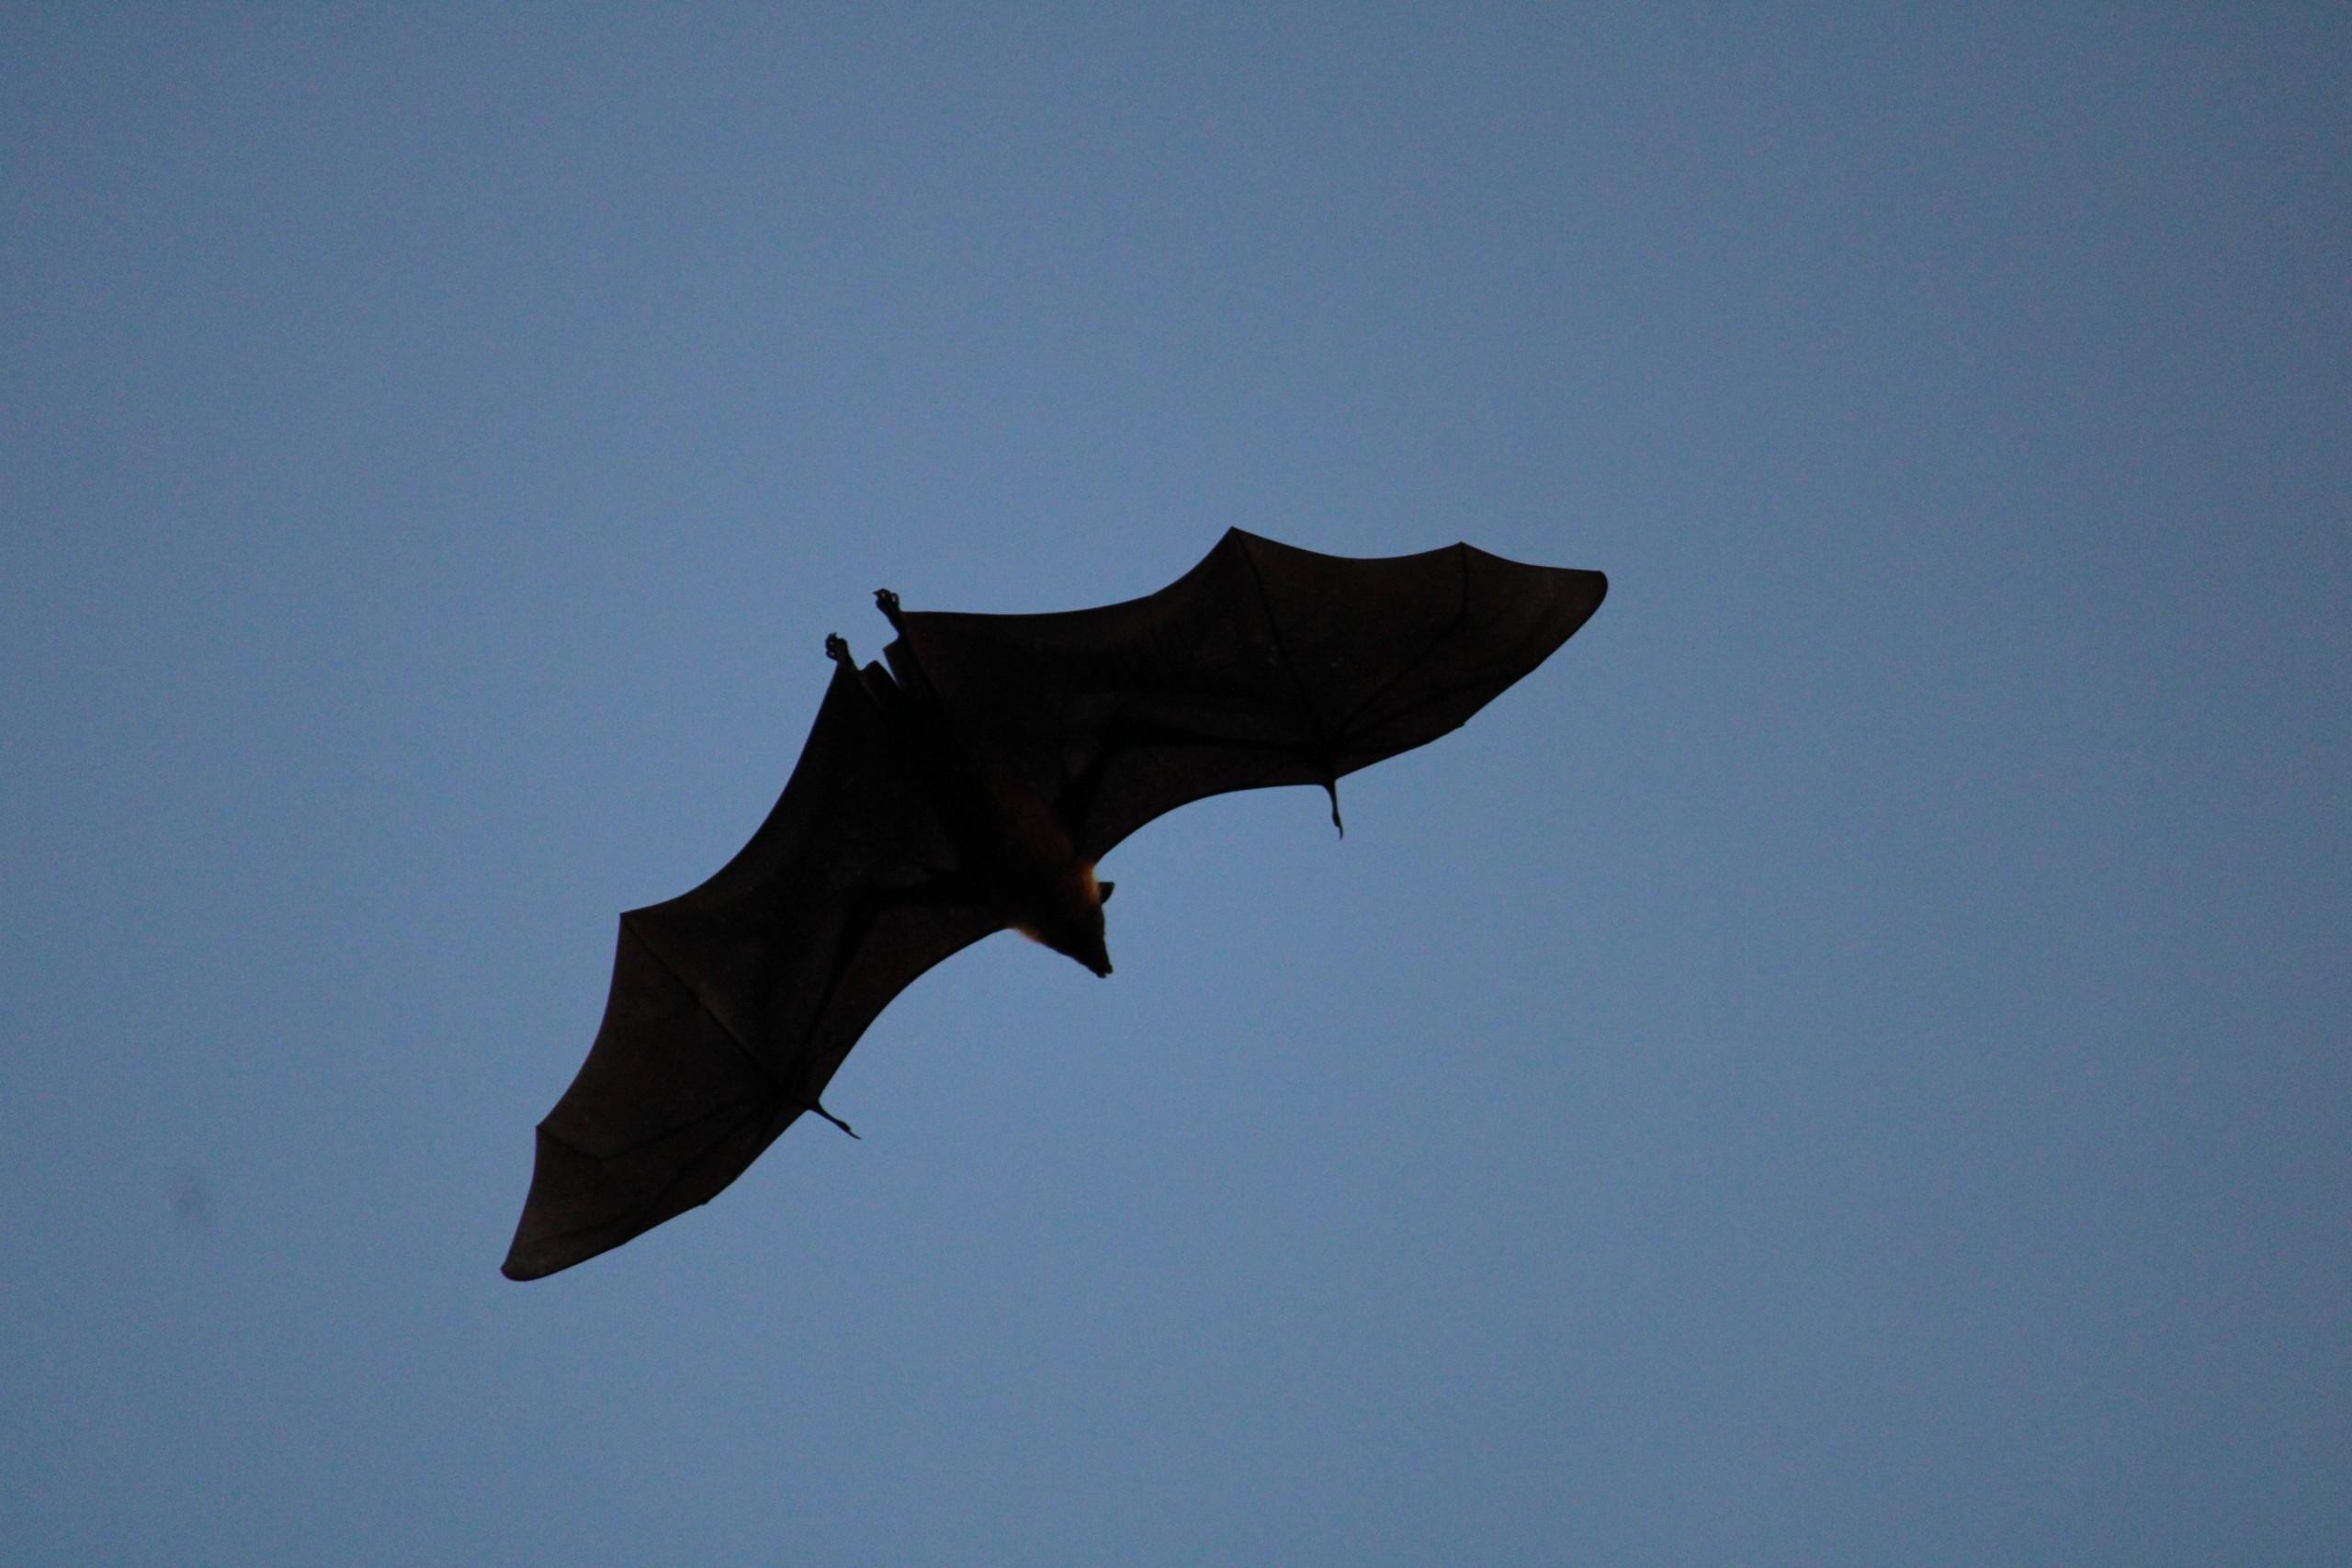 A flying bat